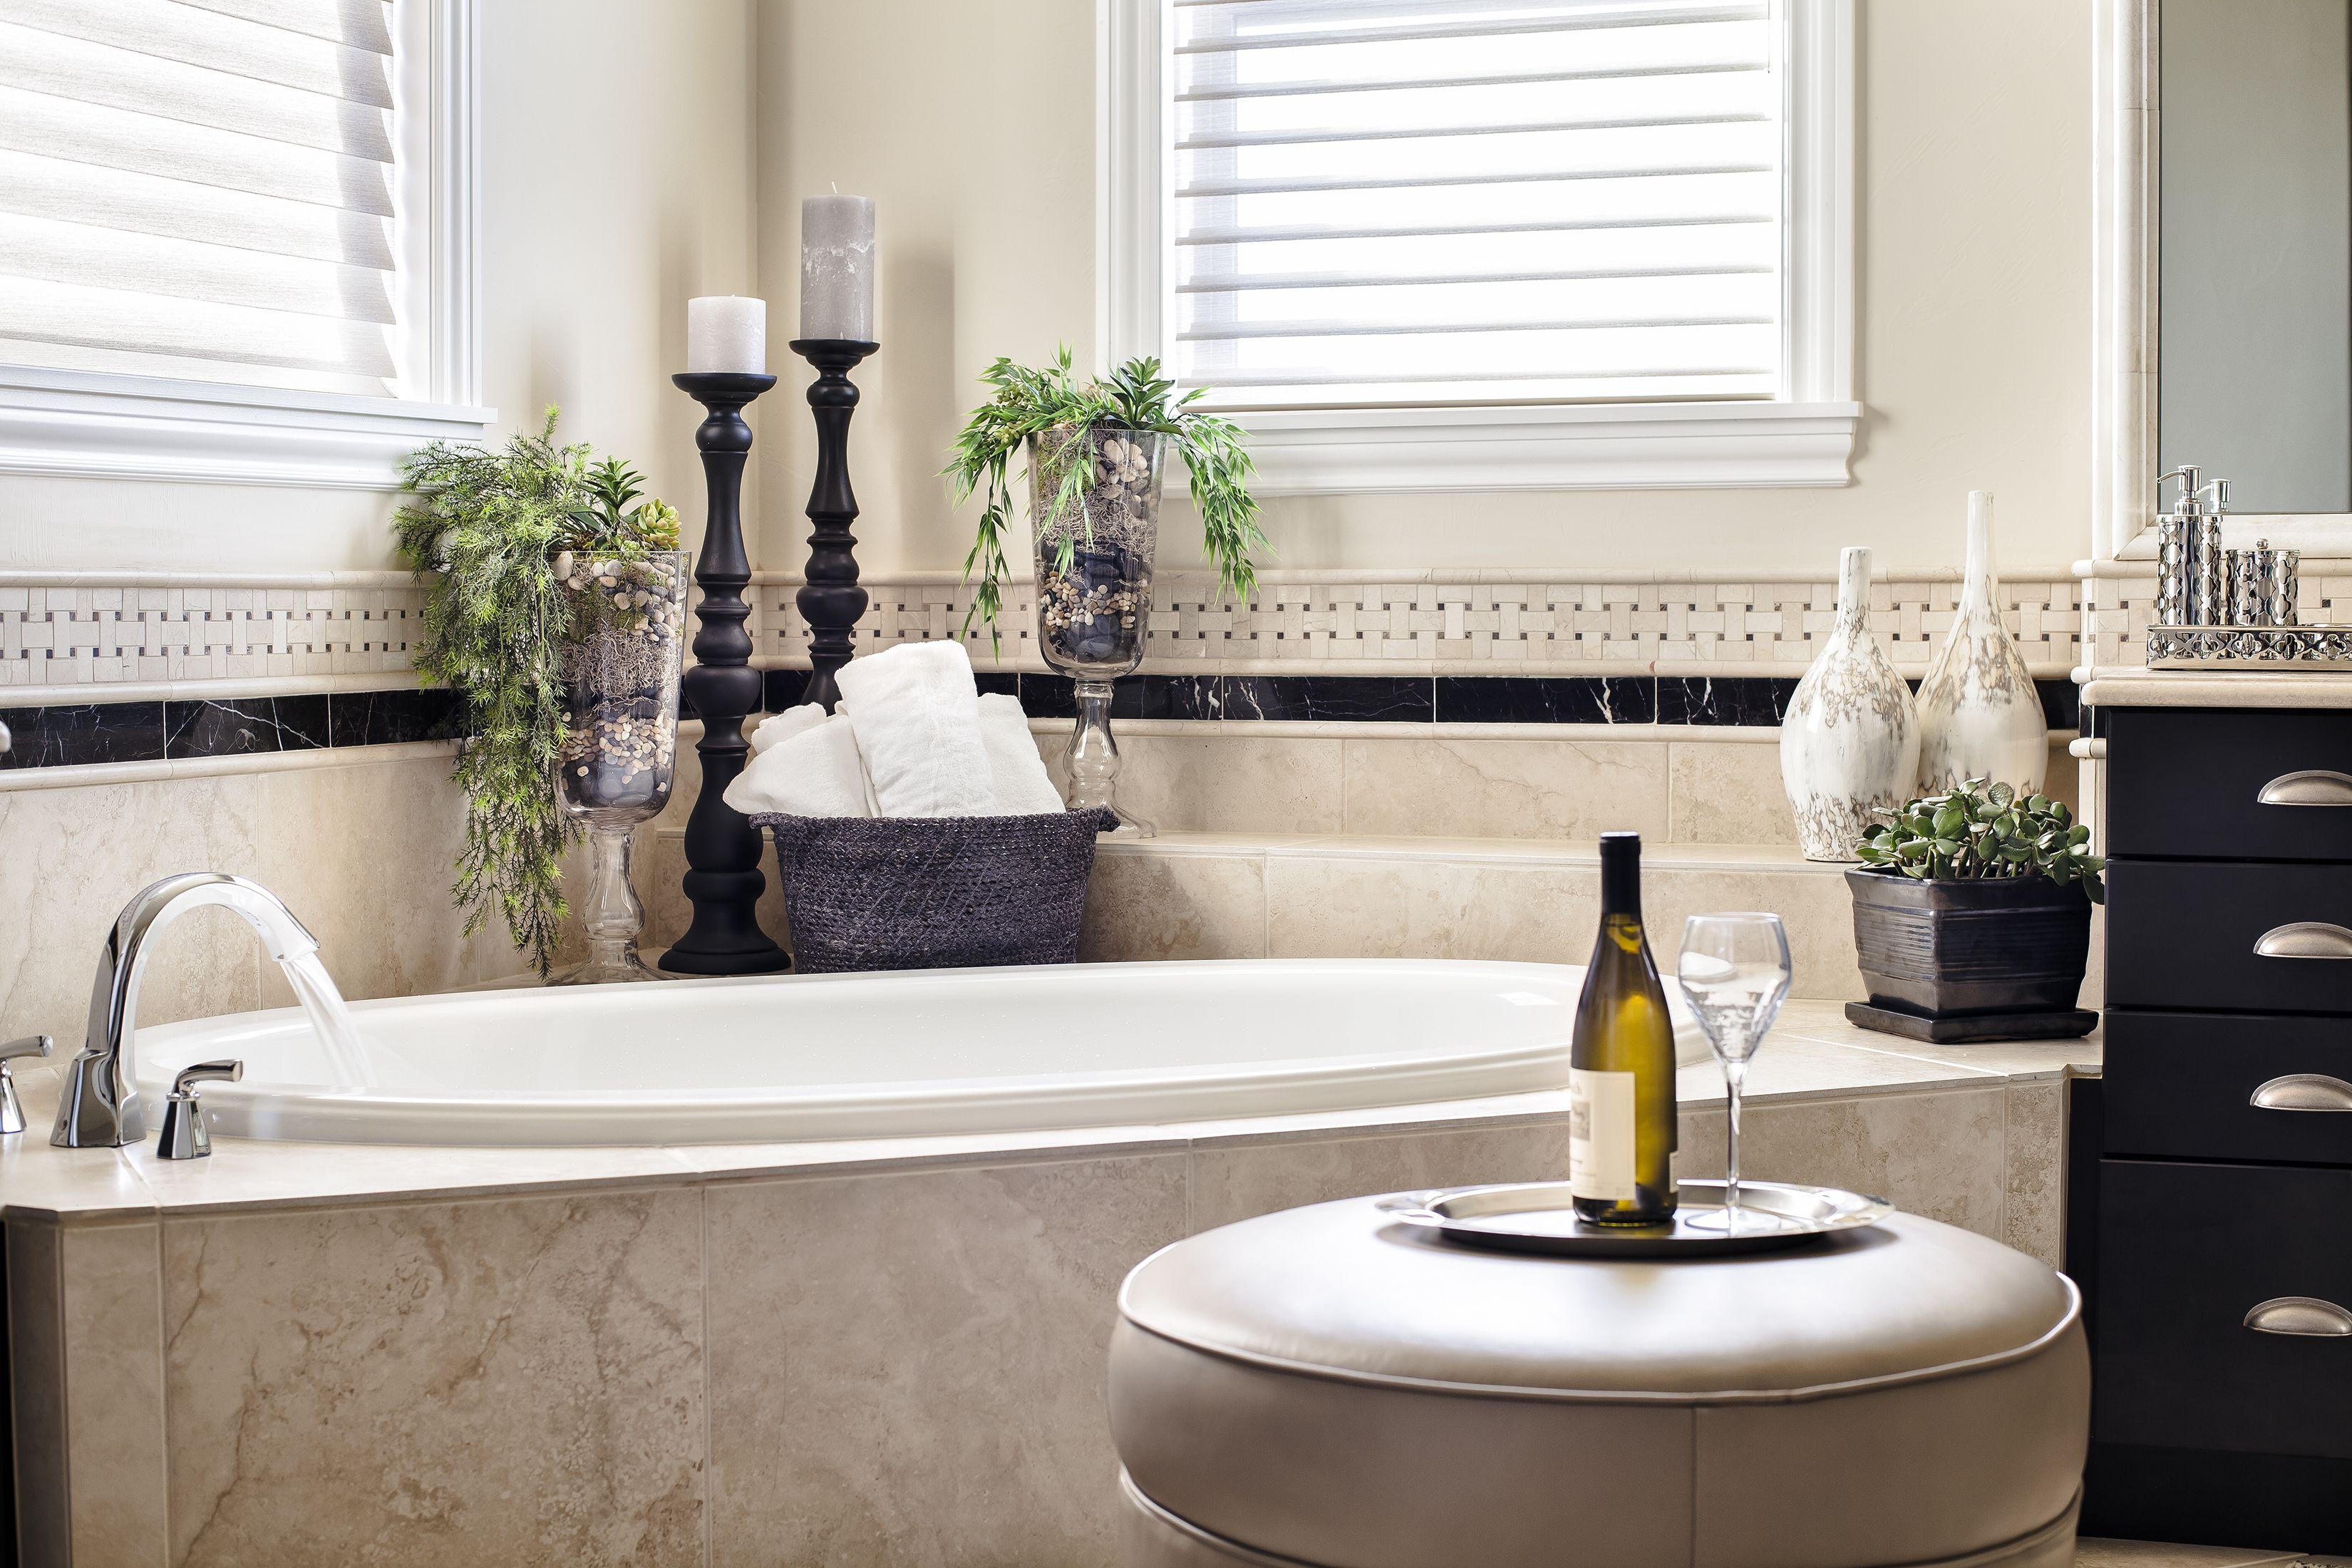 berardi residence master bathroom luxury interior design interior rh pinterest com architecture and interior design firm denver hospitality interior design firms denver